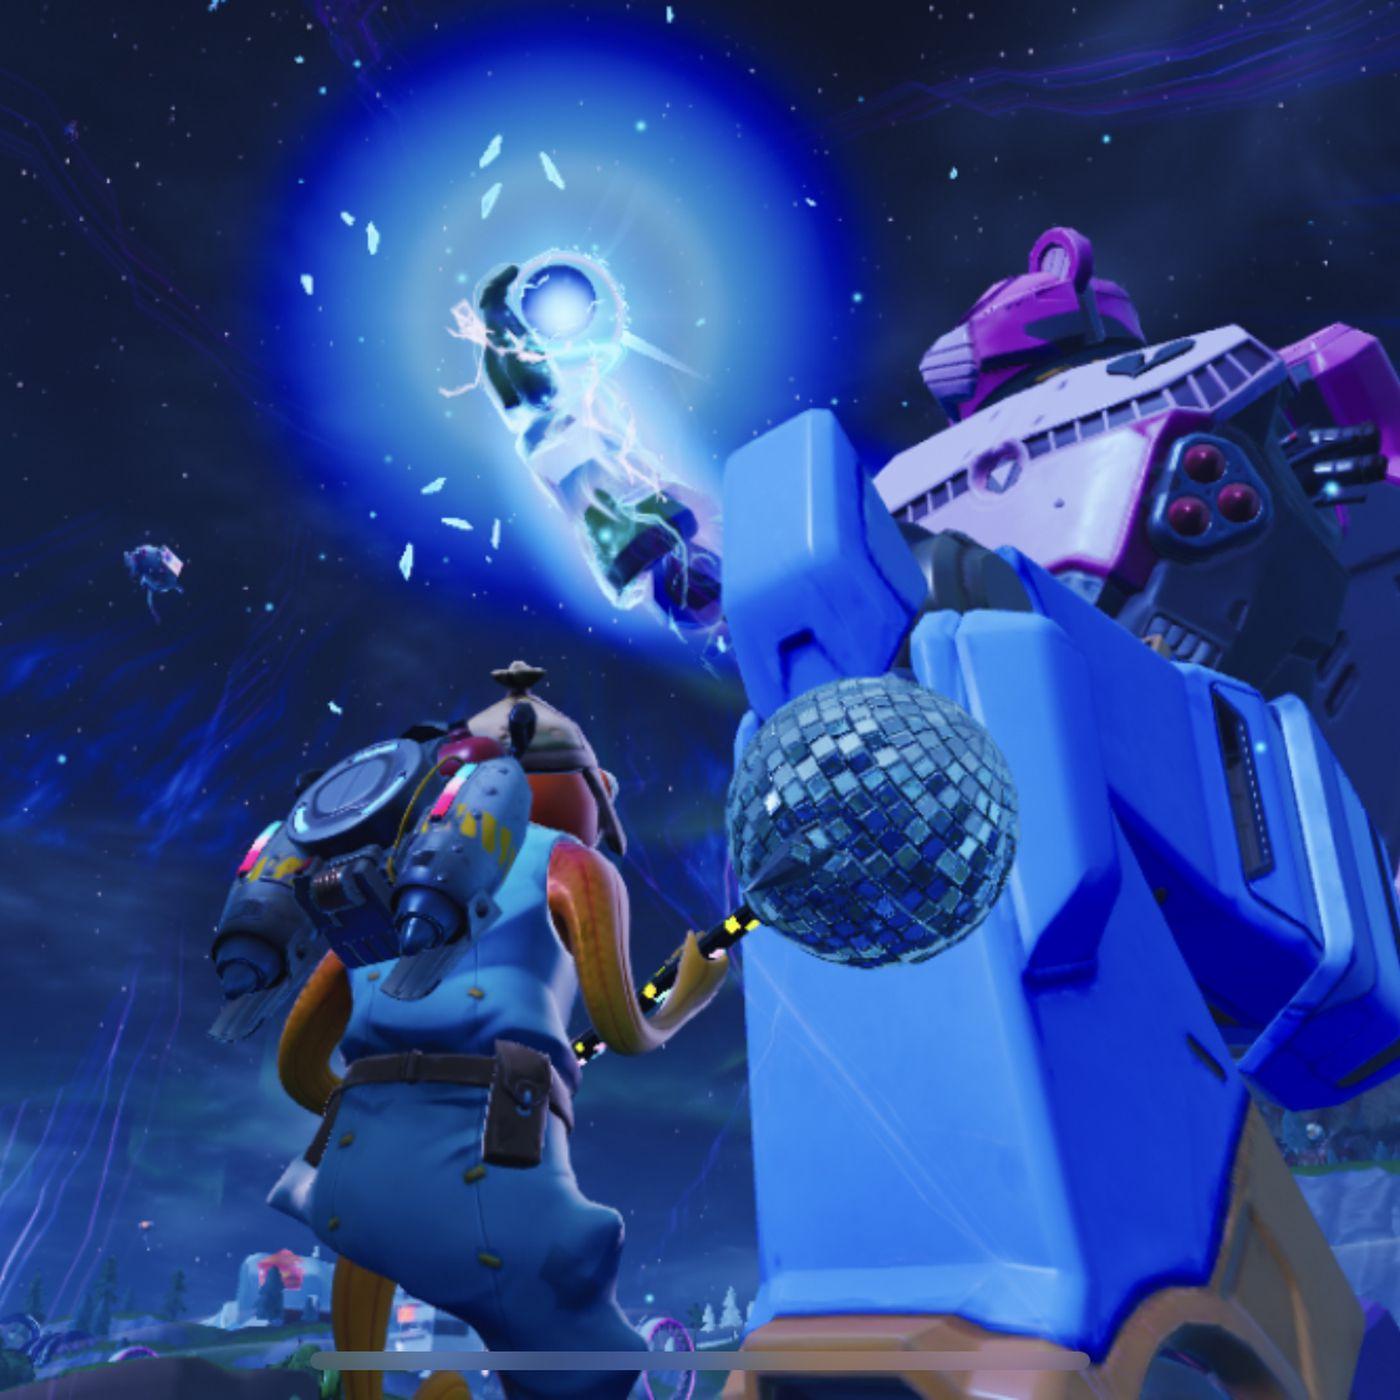 Fortnite S Mecha Monster Battle Was Its Most Impressive And